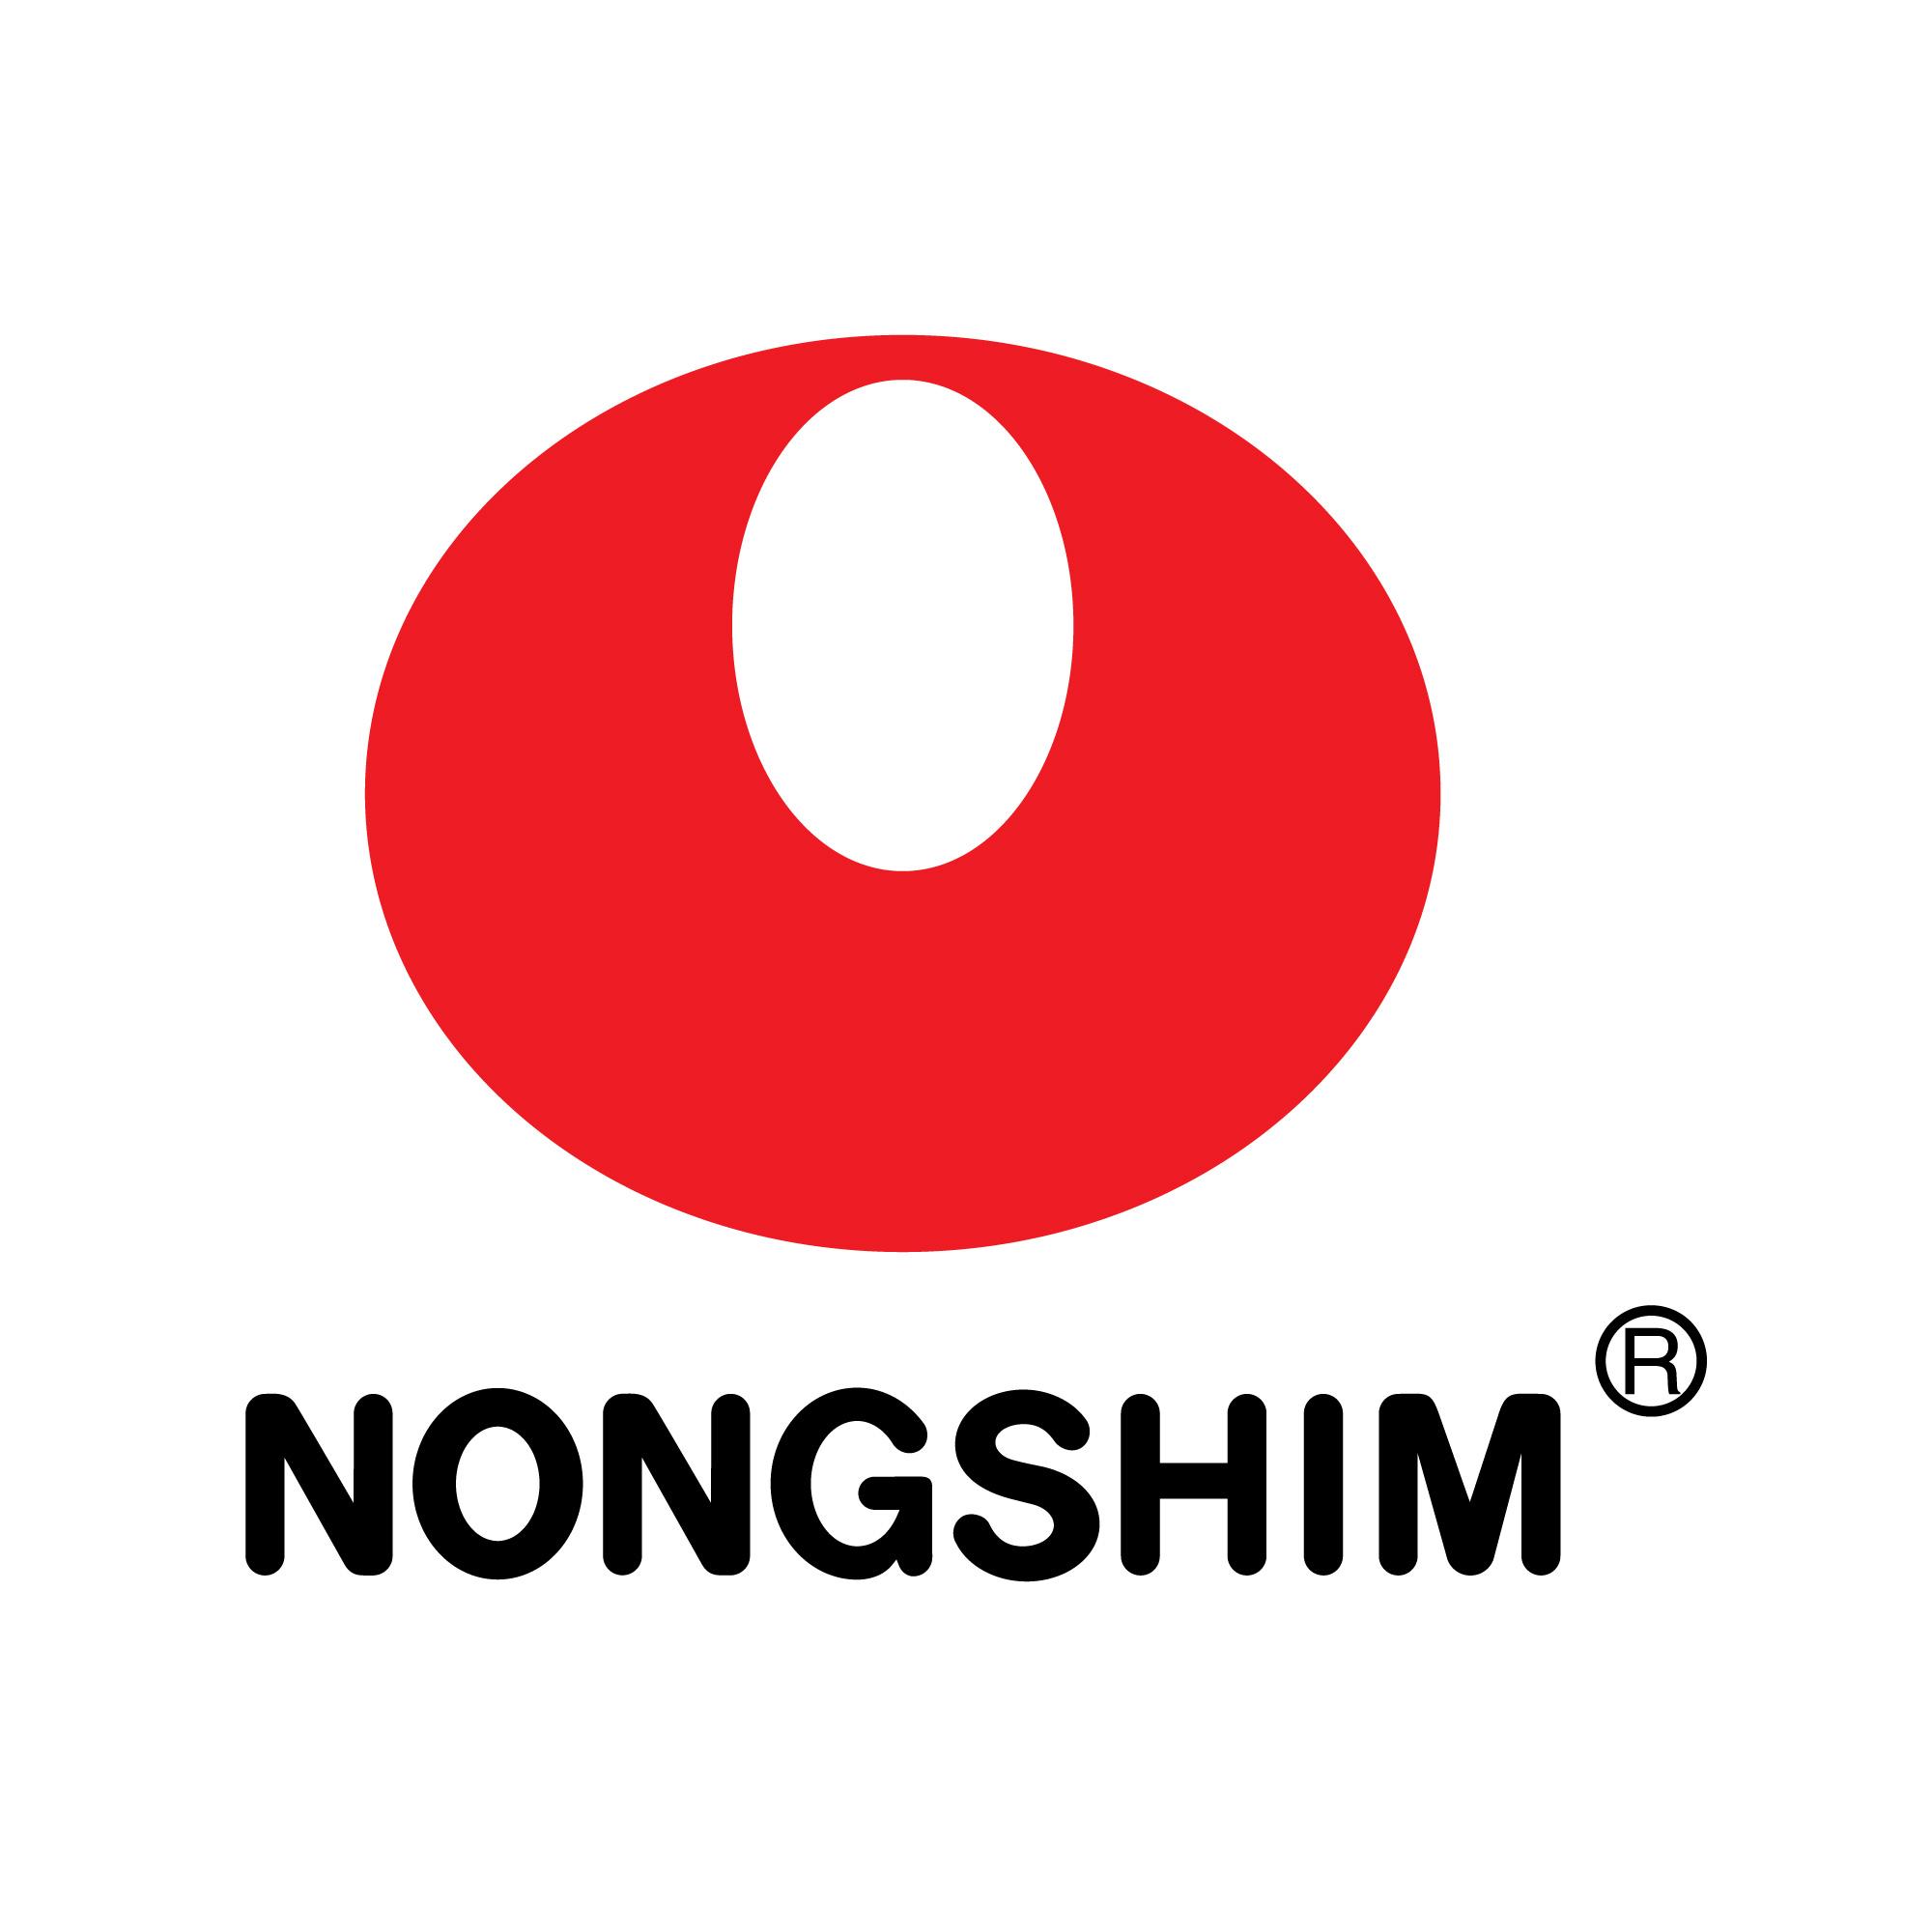 nongshim_logo_vertical_0.jpg